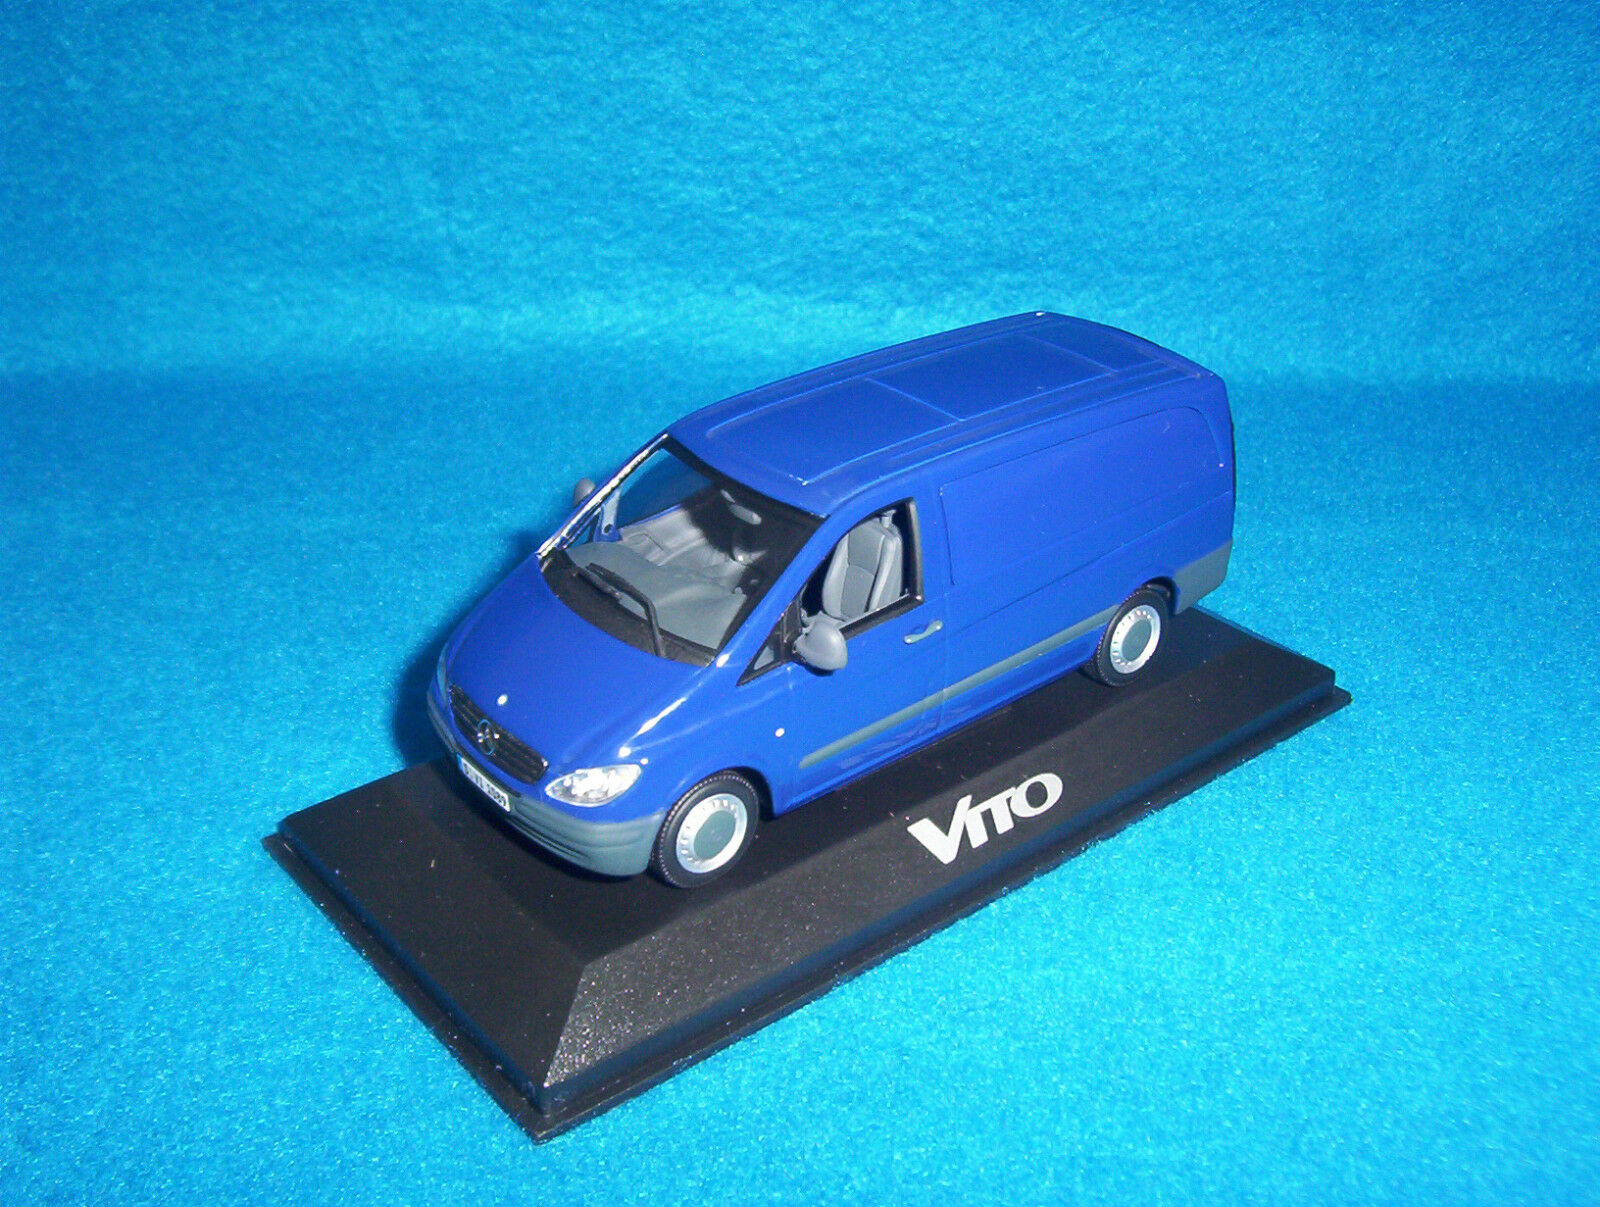 Mercedes Benz Vito 109 CDI 2003 camionnette Panel Van Bleu bleu 1 43 Nouveau neuf dans sa boîte